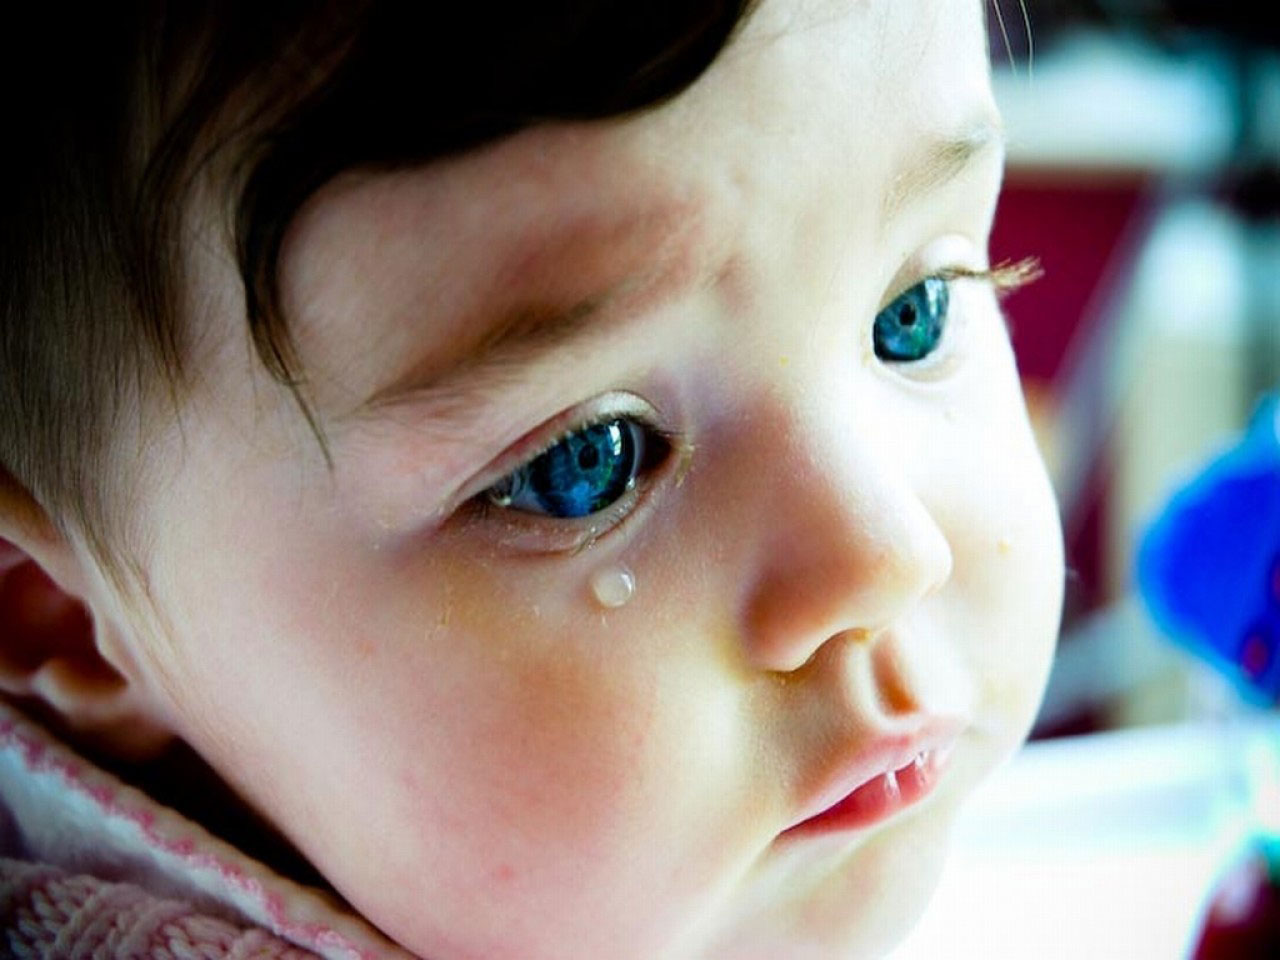 http://2.bp.blogspot.com/-h_x3Kp_g6O8/TjLFnvuOlWI/AAAAAAAABms/7klTcUI3o0U/s1600/child_crying_wallpaper_for_laptop.jpg